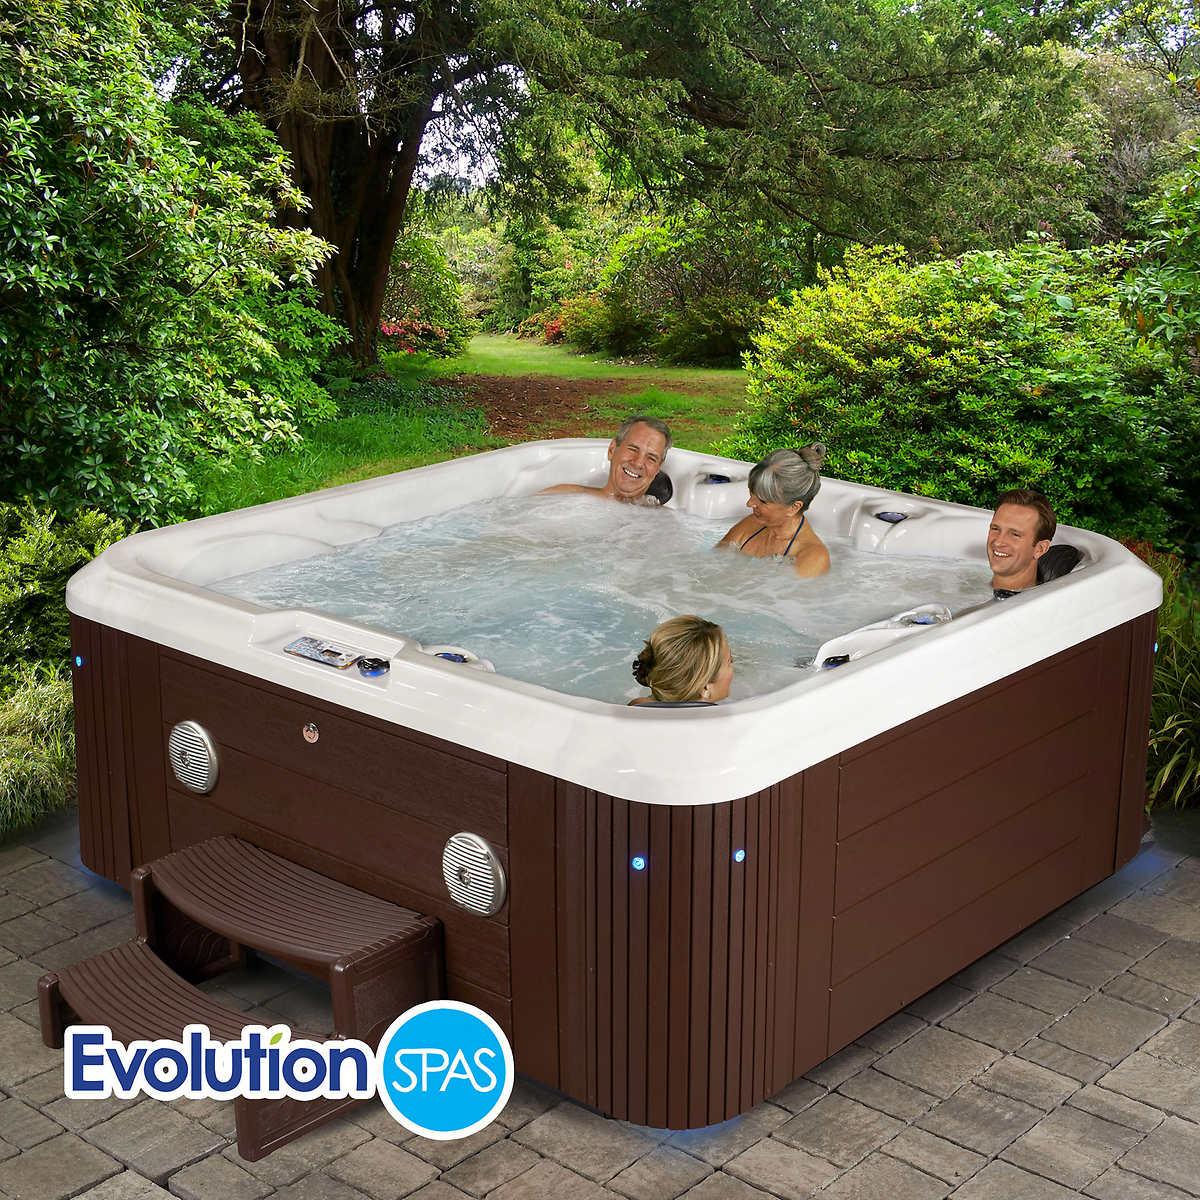 Evolution spas hampton 90 jet 6 person spa accommodates for Hot tub and sauna